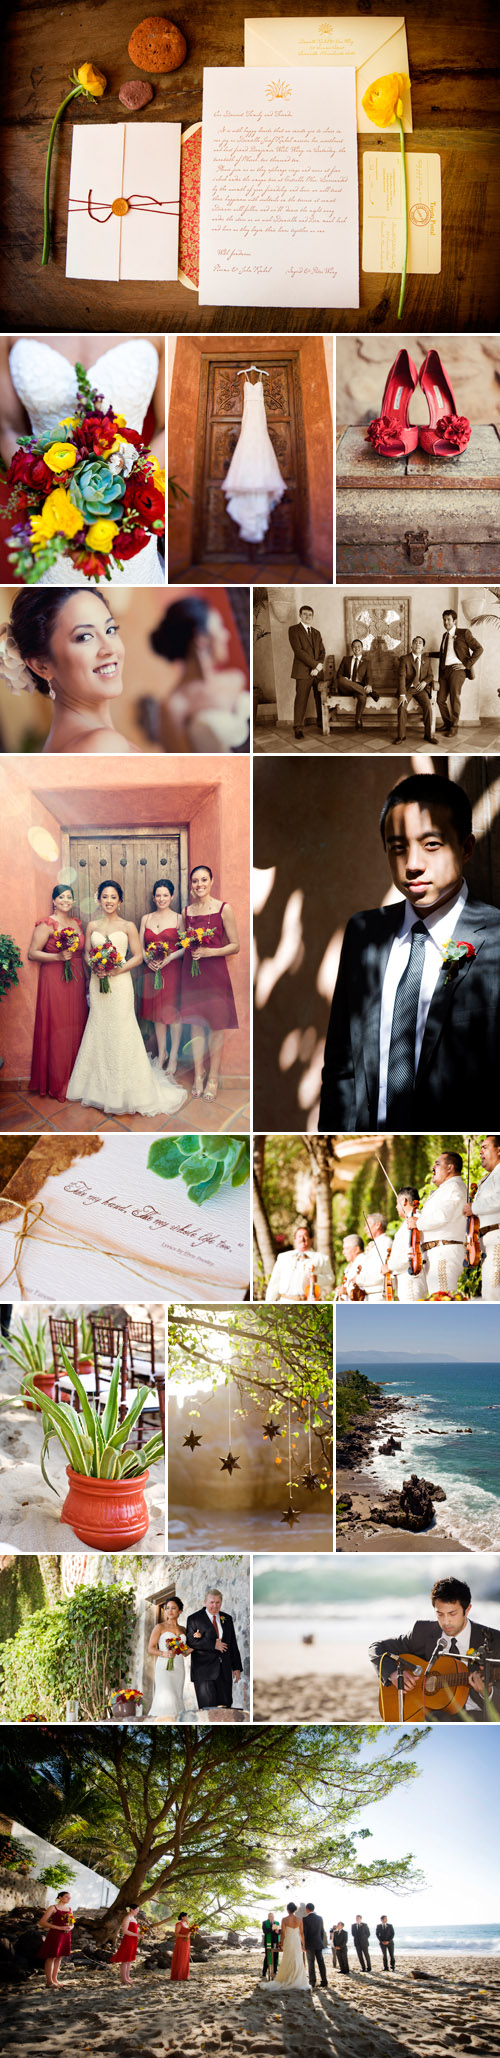 destination wedding at Villa Estrella Mar in Puerto Vallarta, Mexico, poppy, marigold and sangria red wedding color palette, photos by KLK Photography